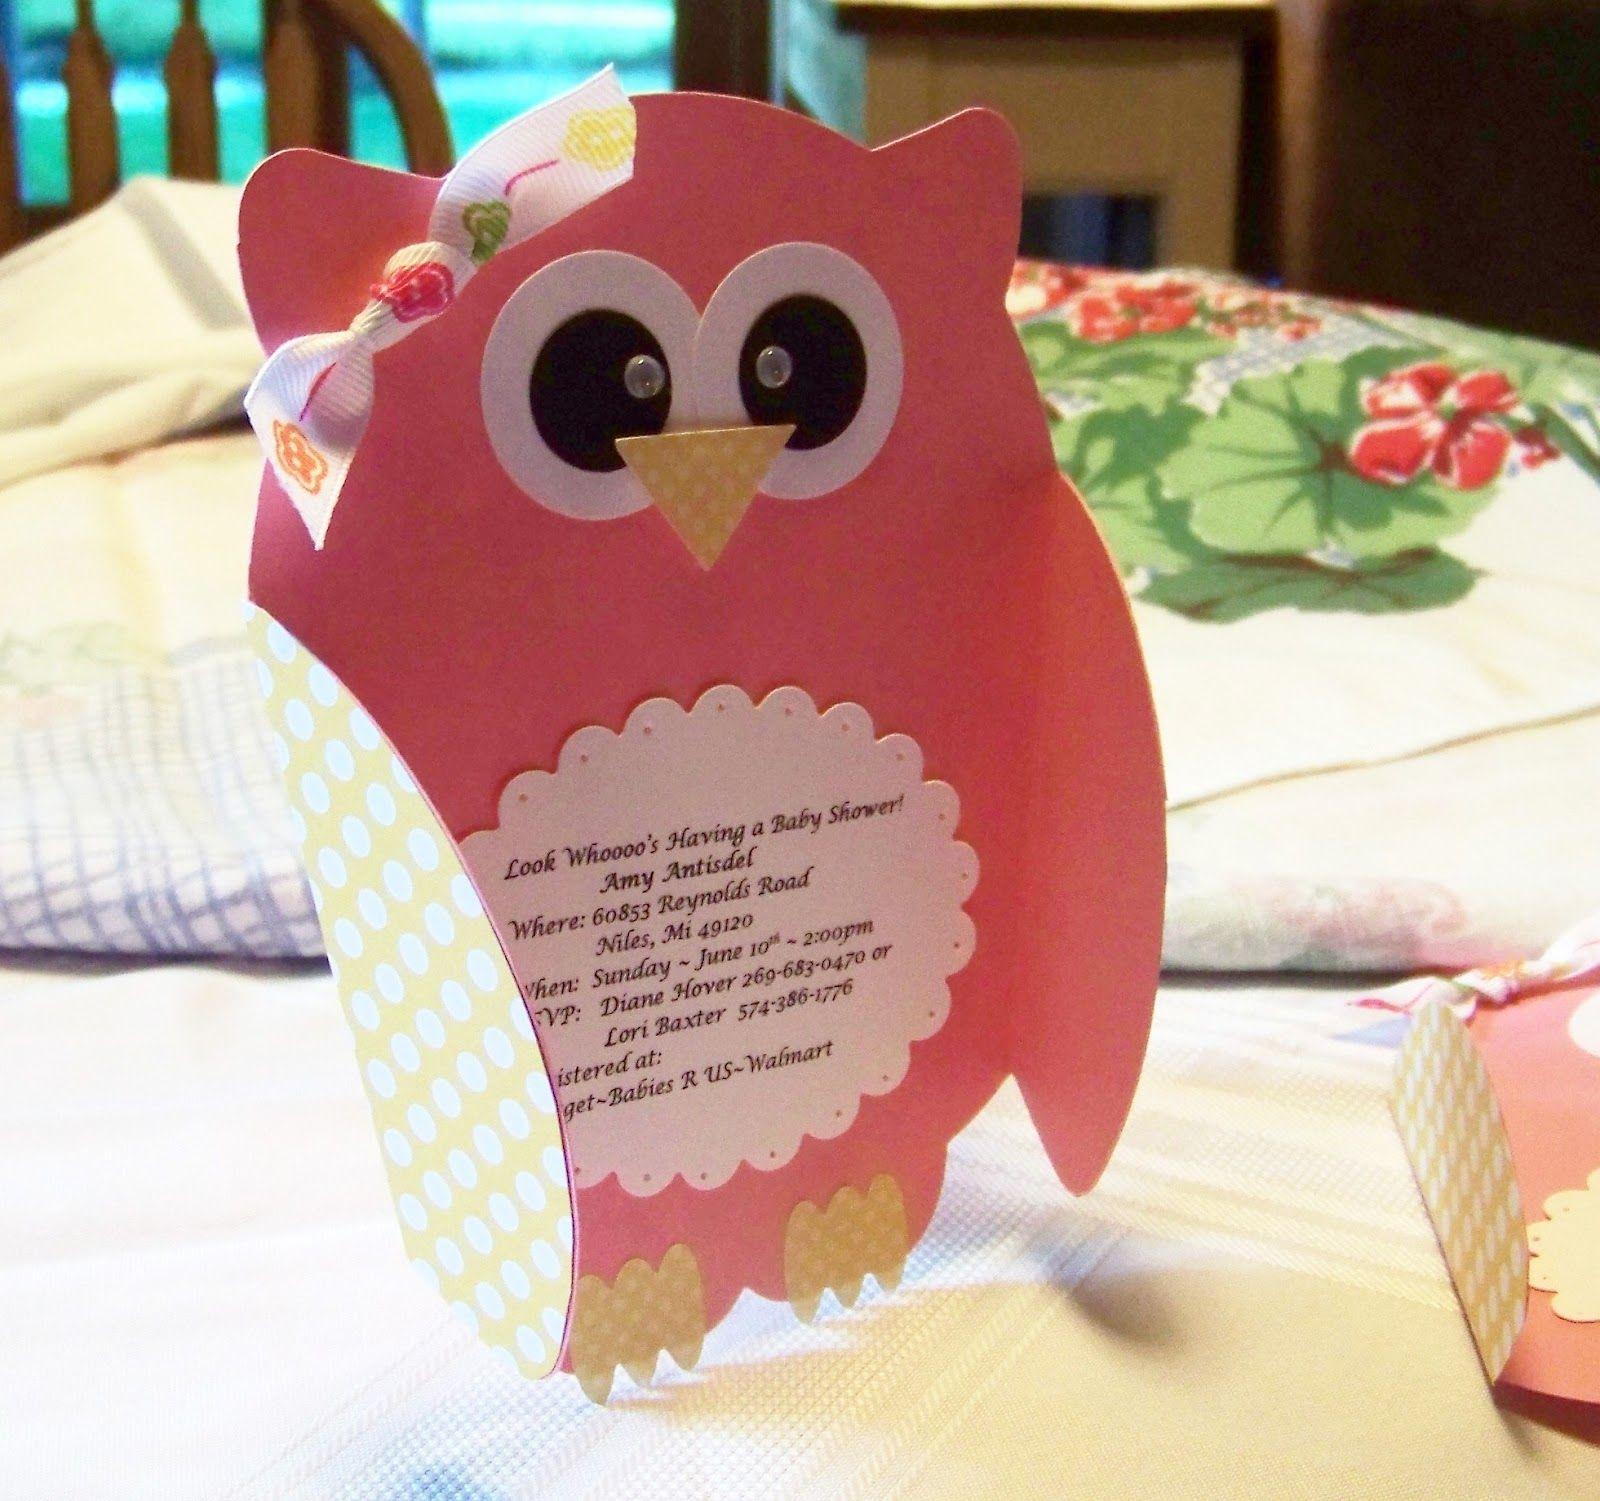 Little Owl Invites | Pinterest | Cricut cartridges, Cricut and Owl